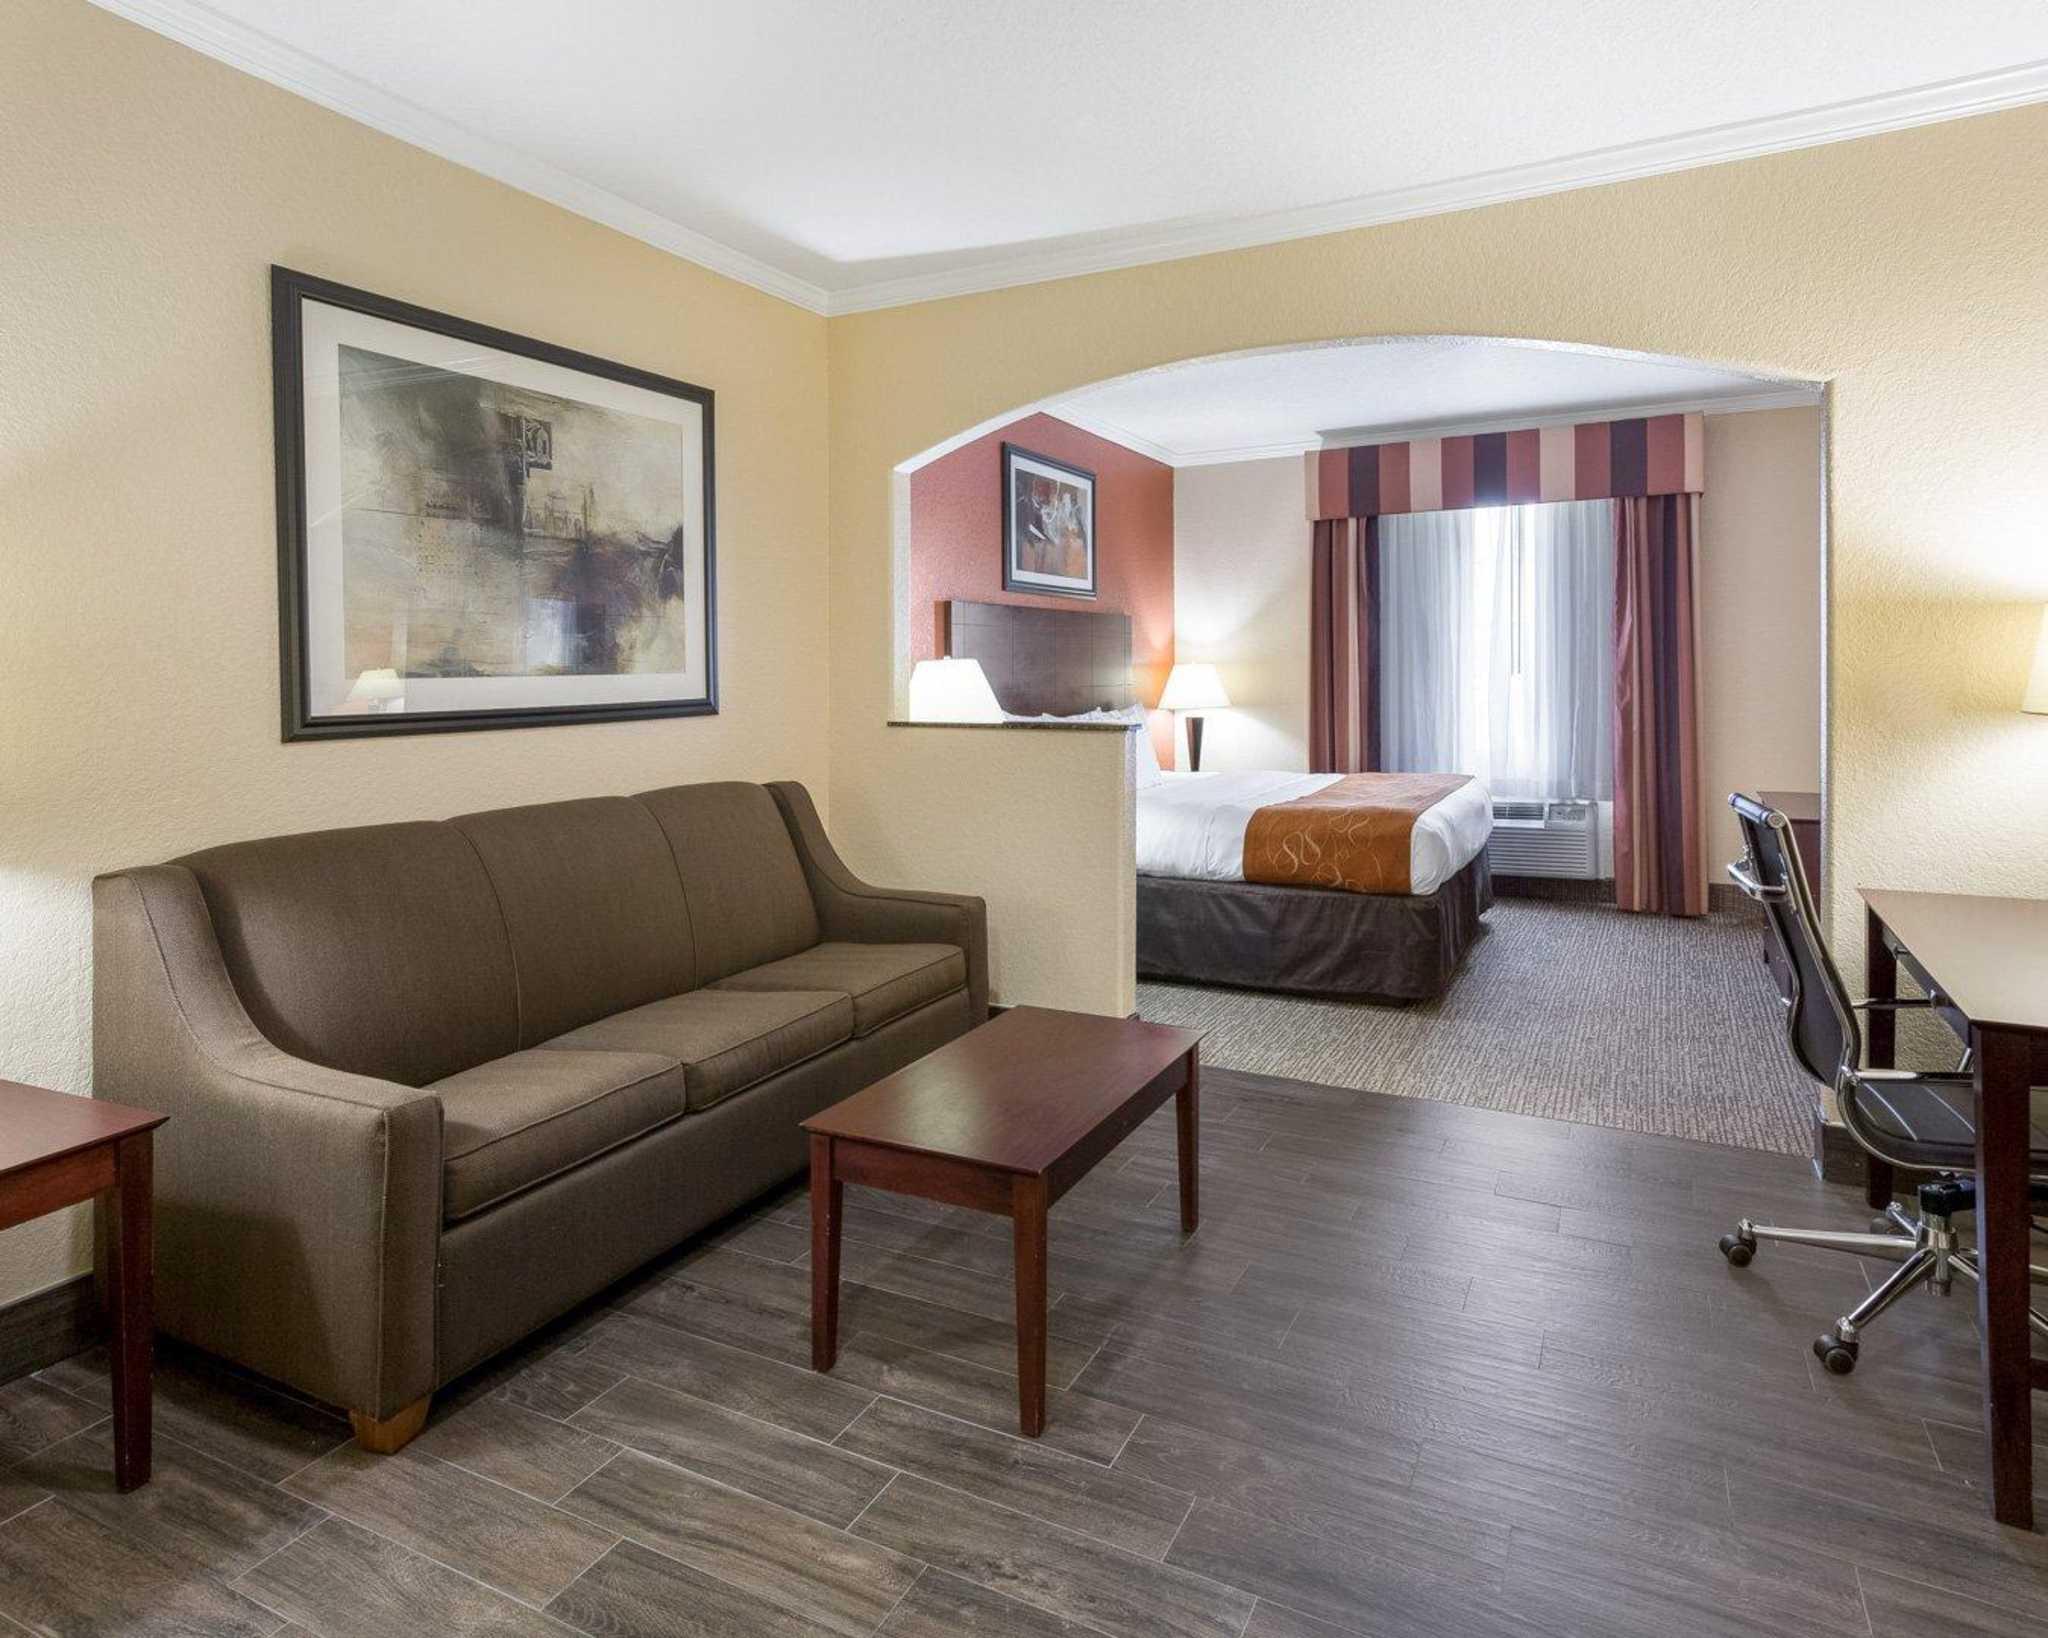 Comfort Suites image 48